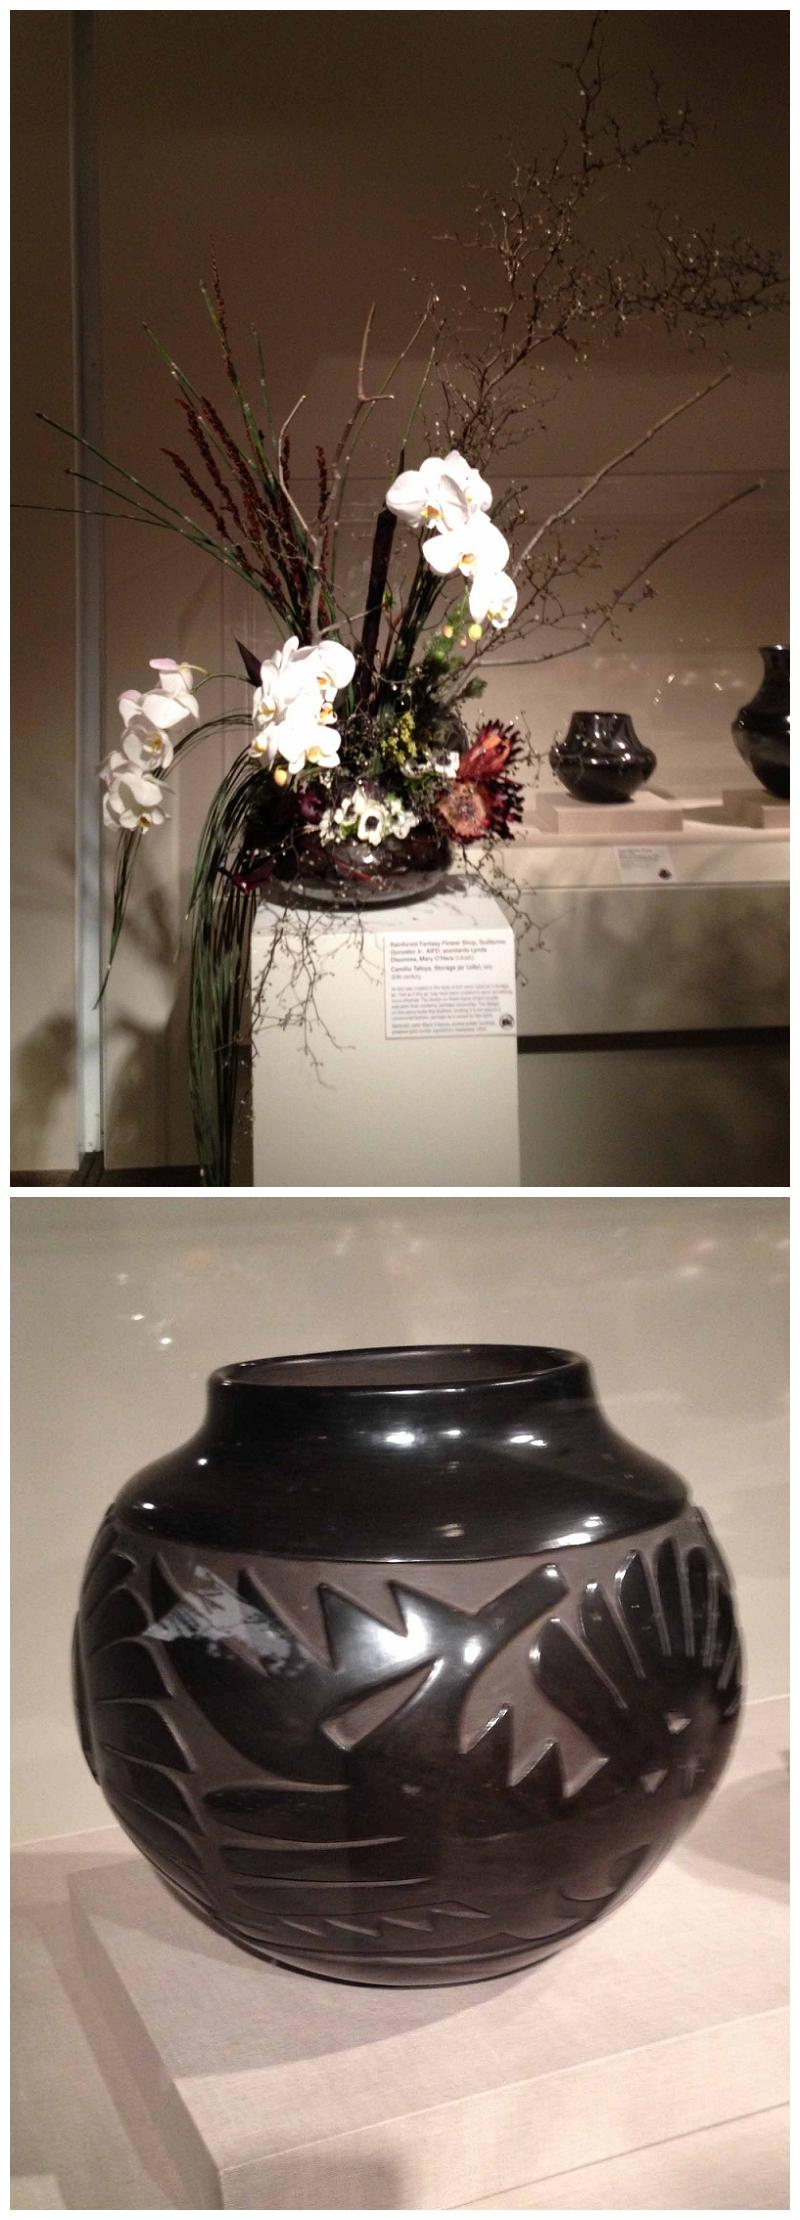 Floral Designer: Rainforest Fantasy Flower Shop. Art Piece: Camilio Tafoya, Storage jar